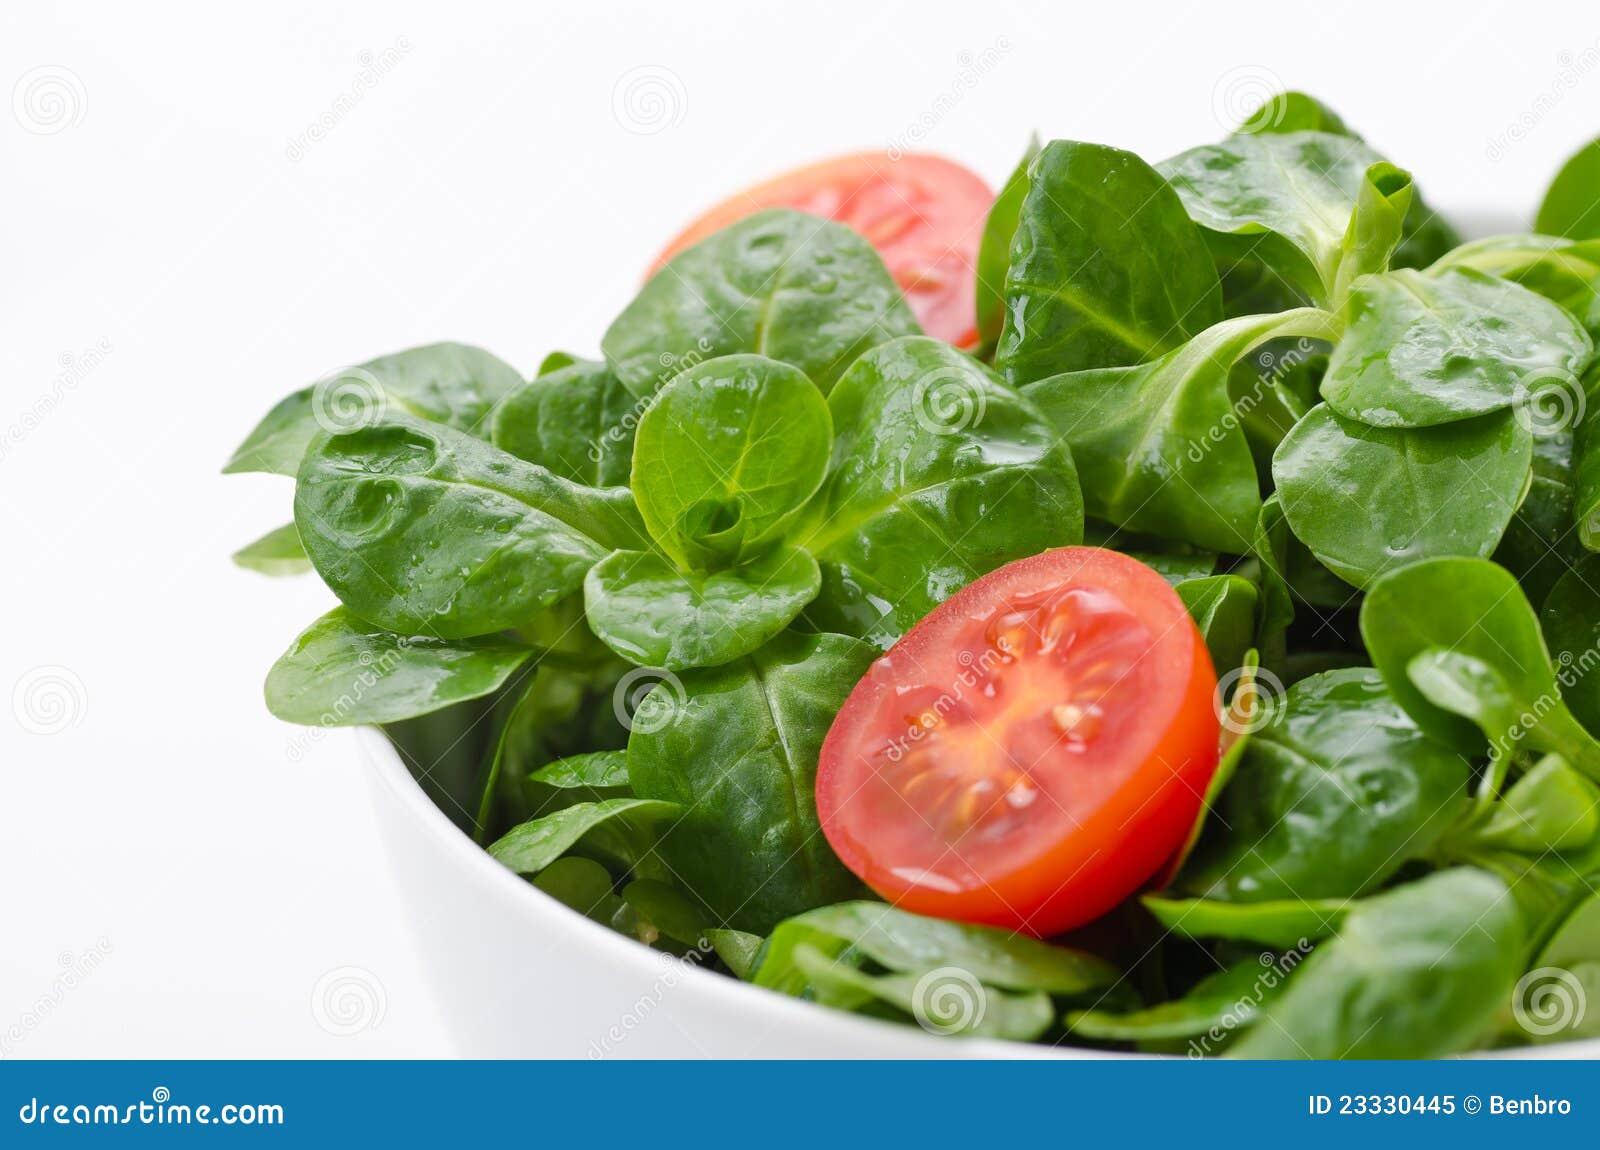 bol de salade verte et de tomates photo libre de droits image 23330445. Black Bedroom Furniture Sets. Home Design Ideas